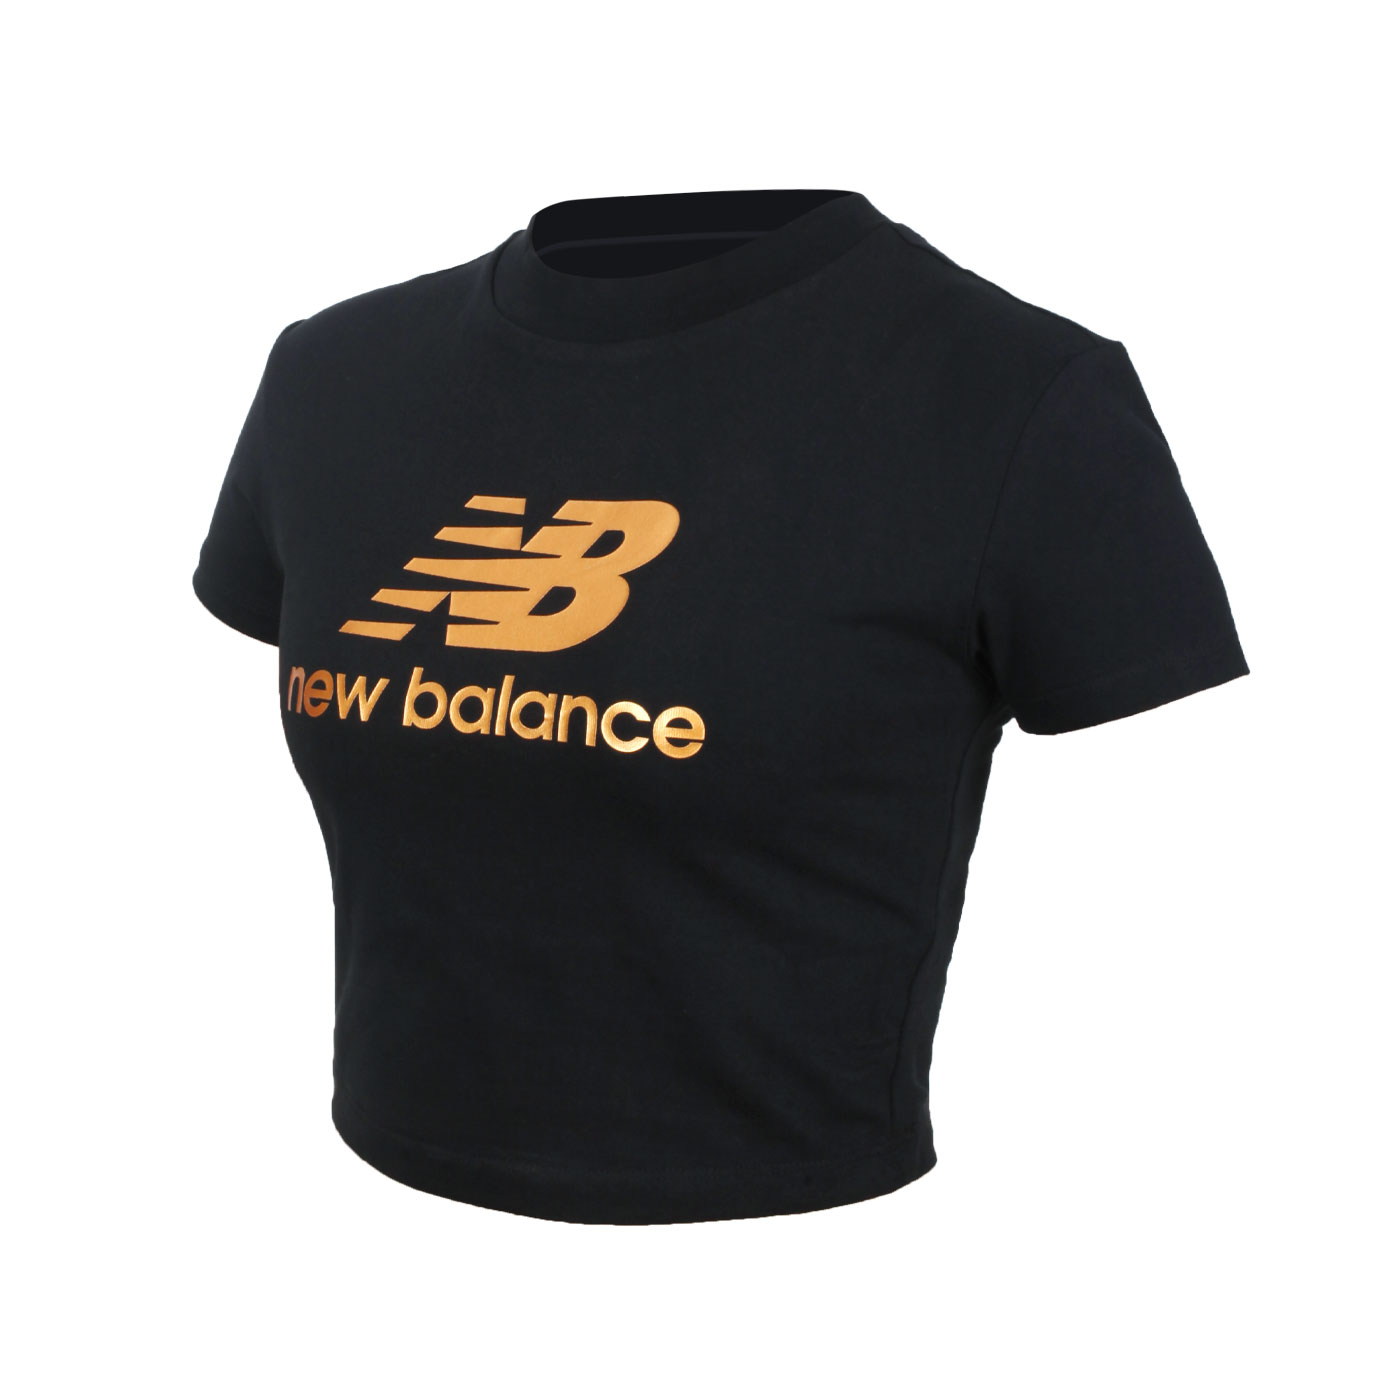 NEW BALANCE 女款短版短袖T恤 WT13503BK - 黑金